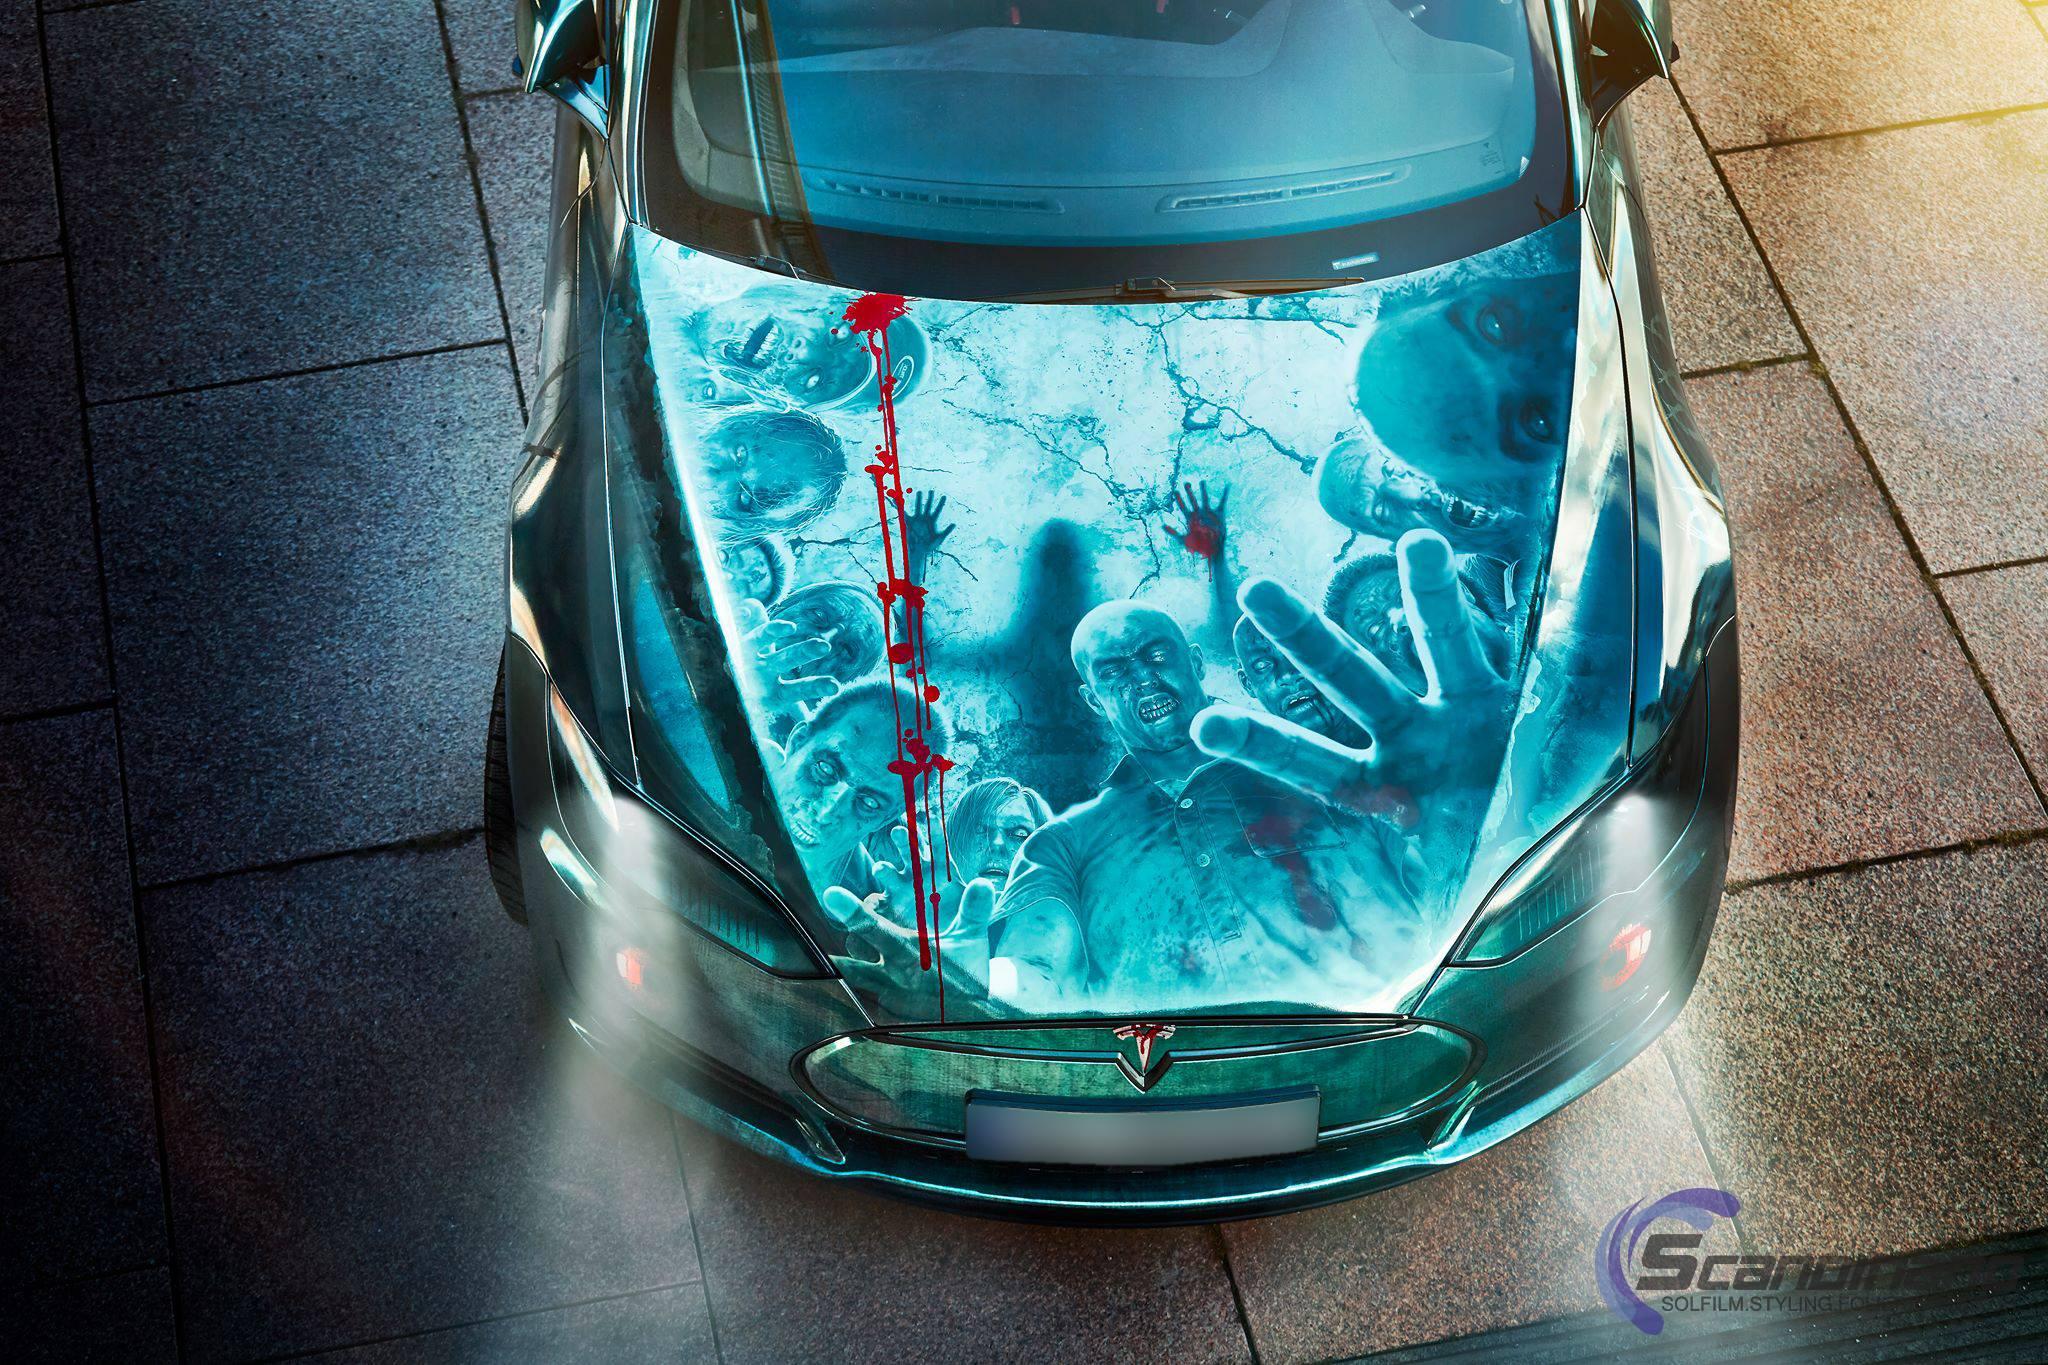 Elektroauto Tesla Model S Zombie motorhaube - Mein Elektroauto